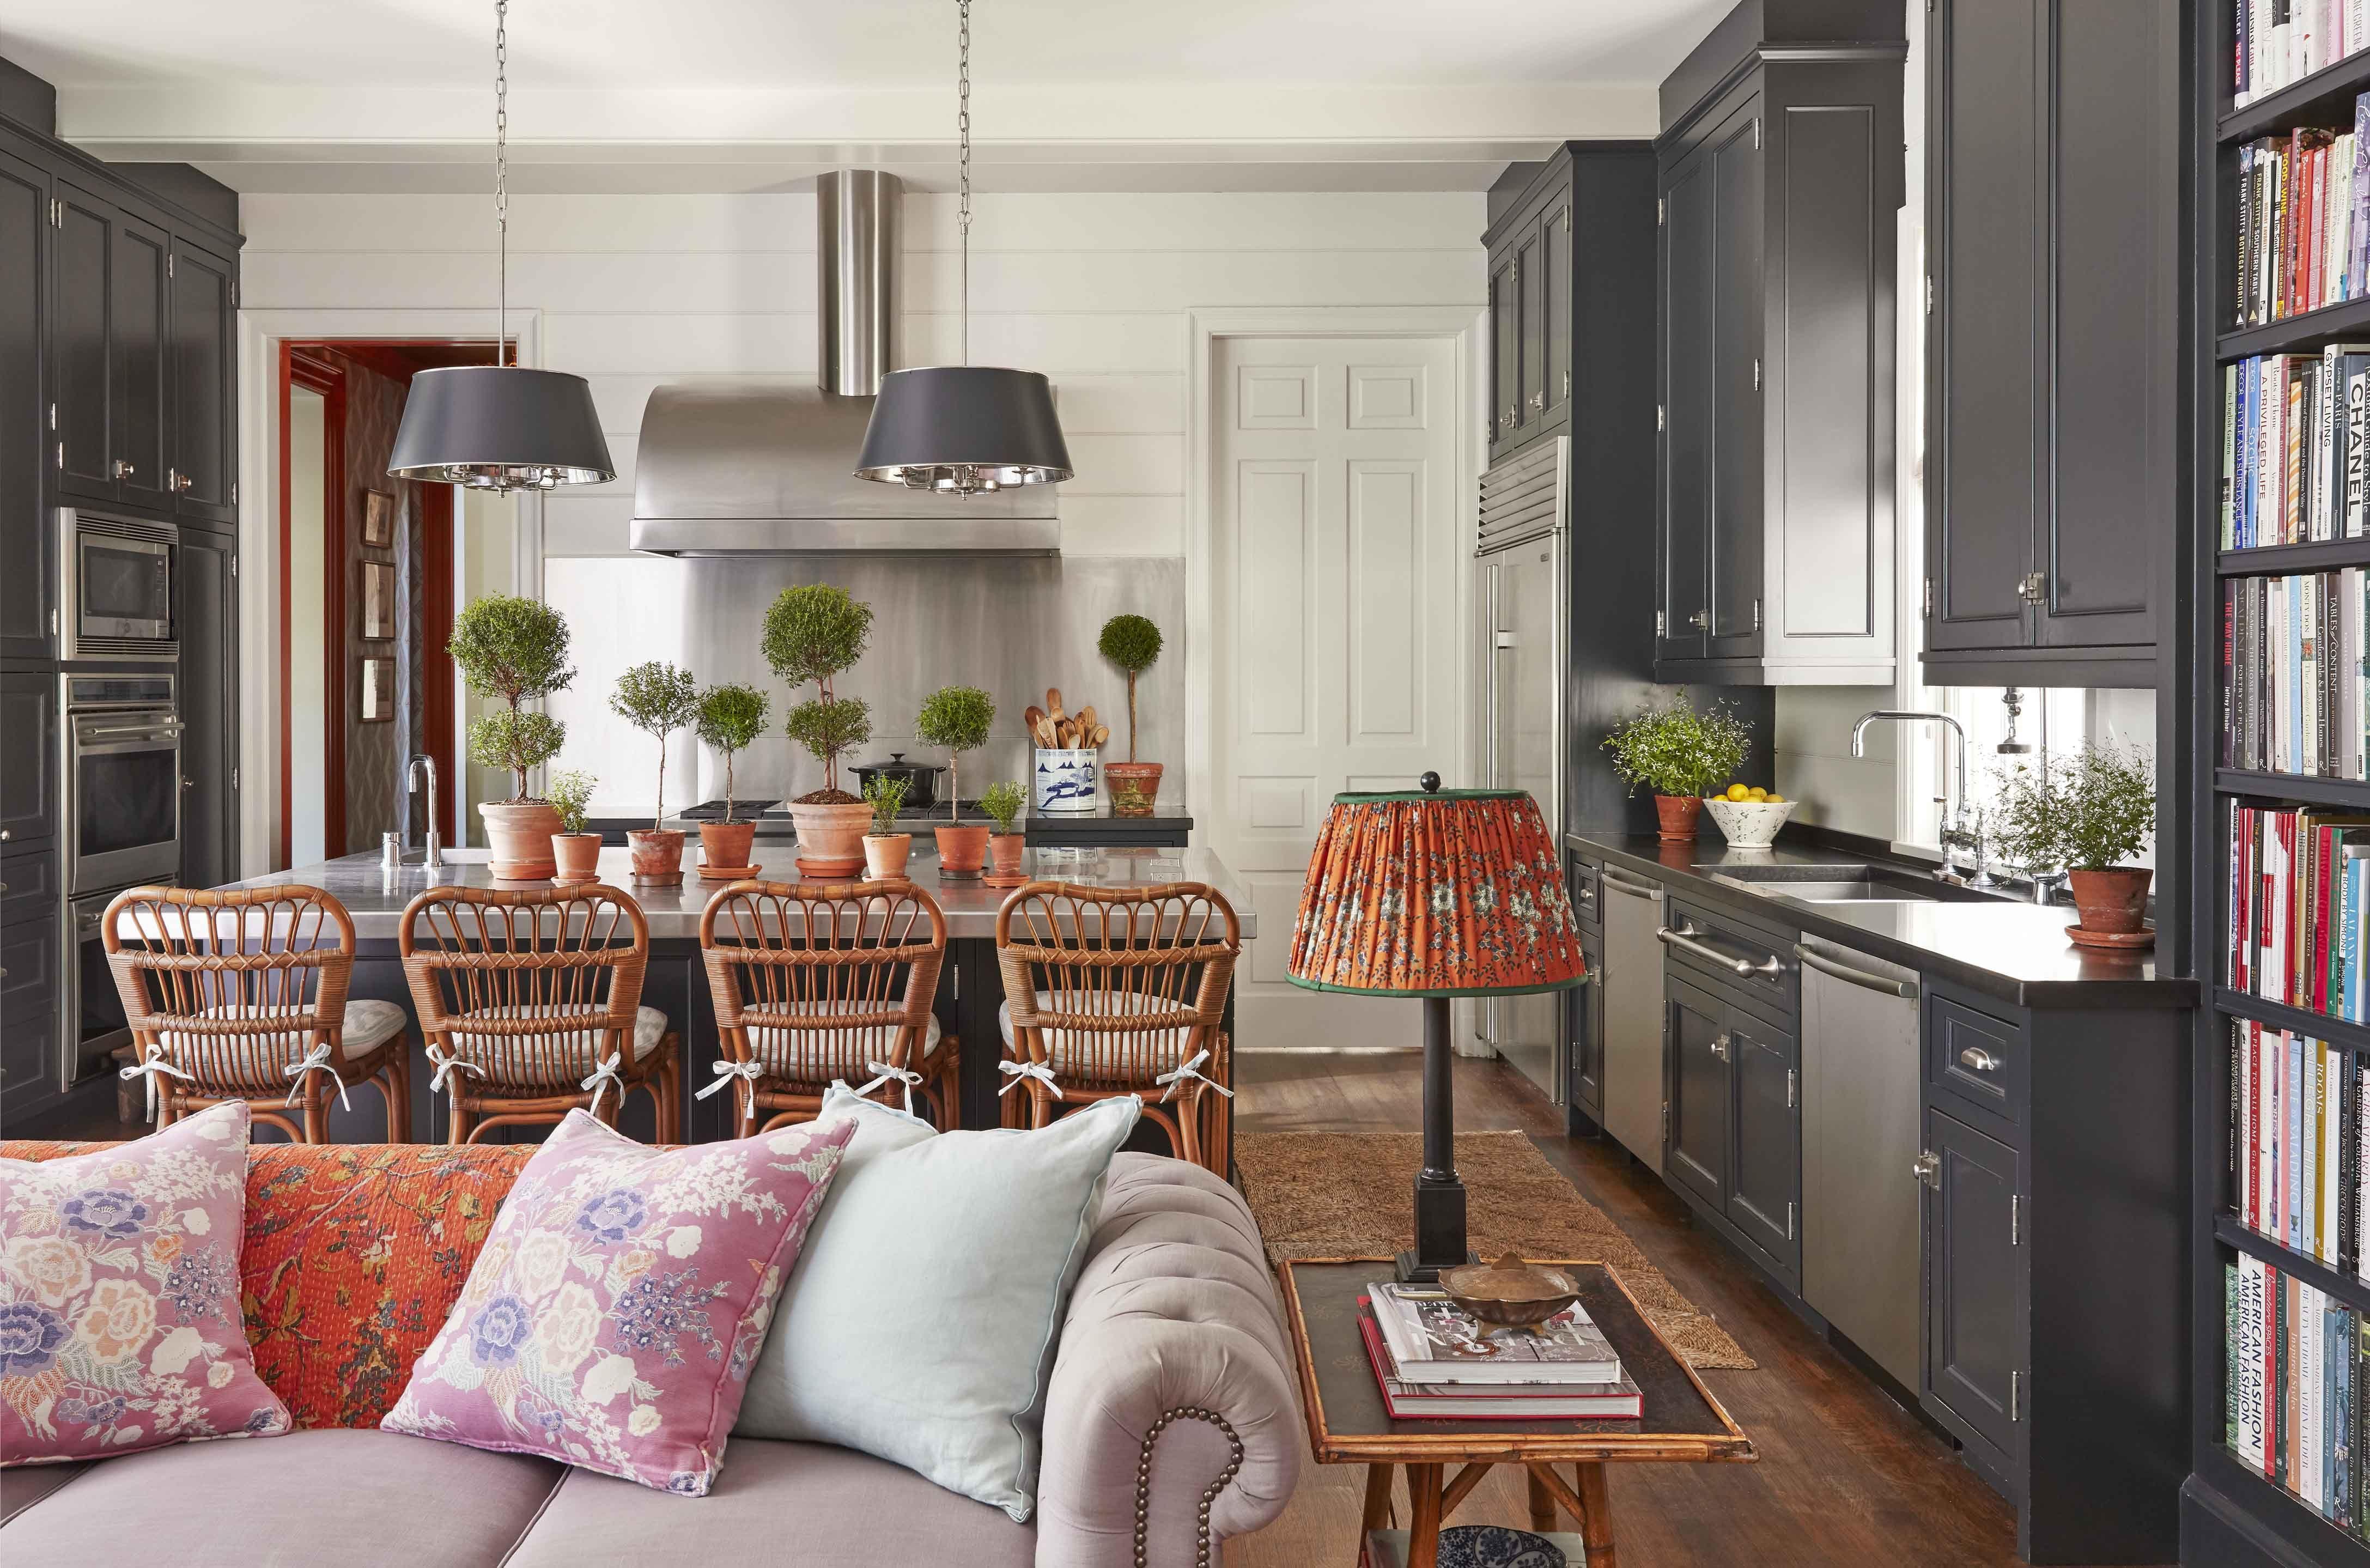 22 Best Kitchen Decor Ideas Decorating For The Kitchen